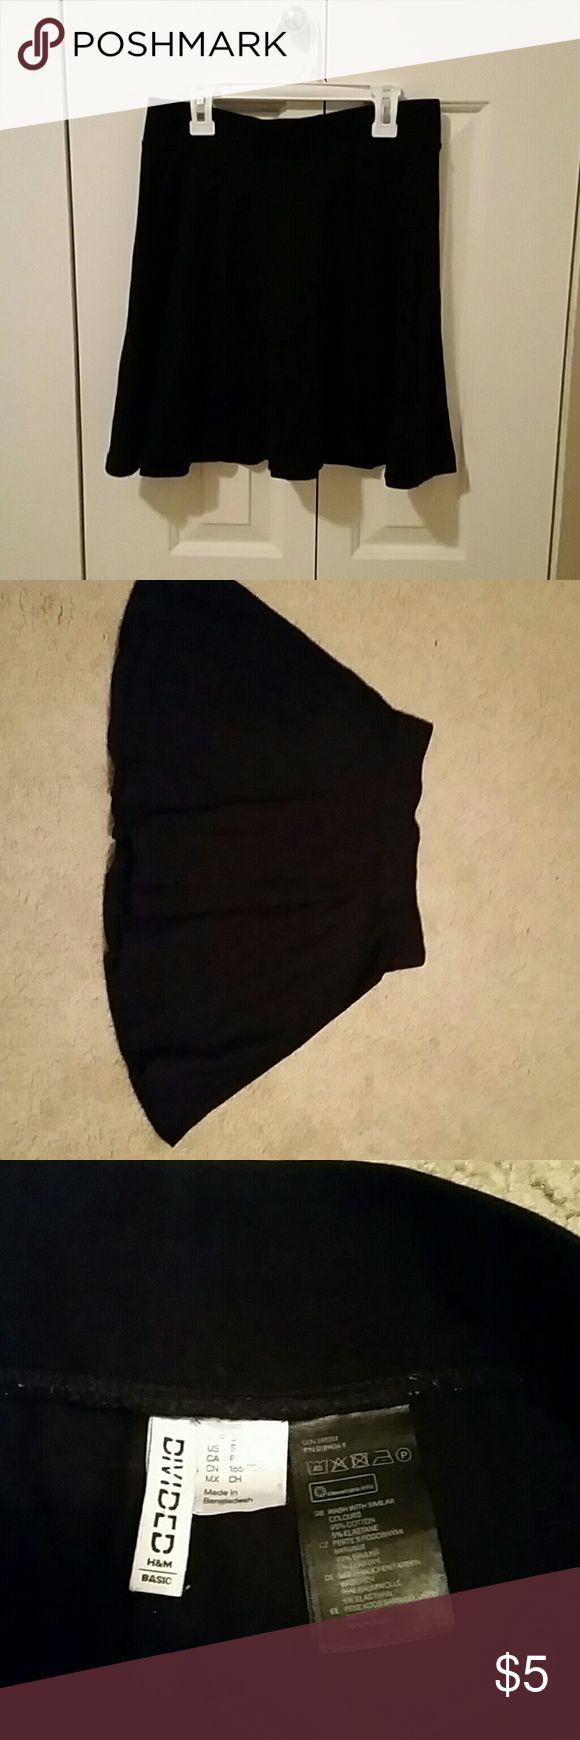 Black Circle Skirt Simple black circle skirt by H&M. Good condition. H&M Skirts Circle & Skater